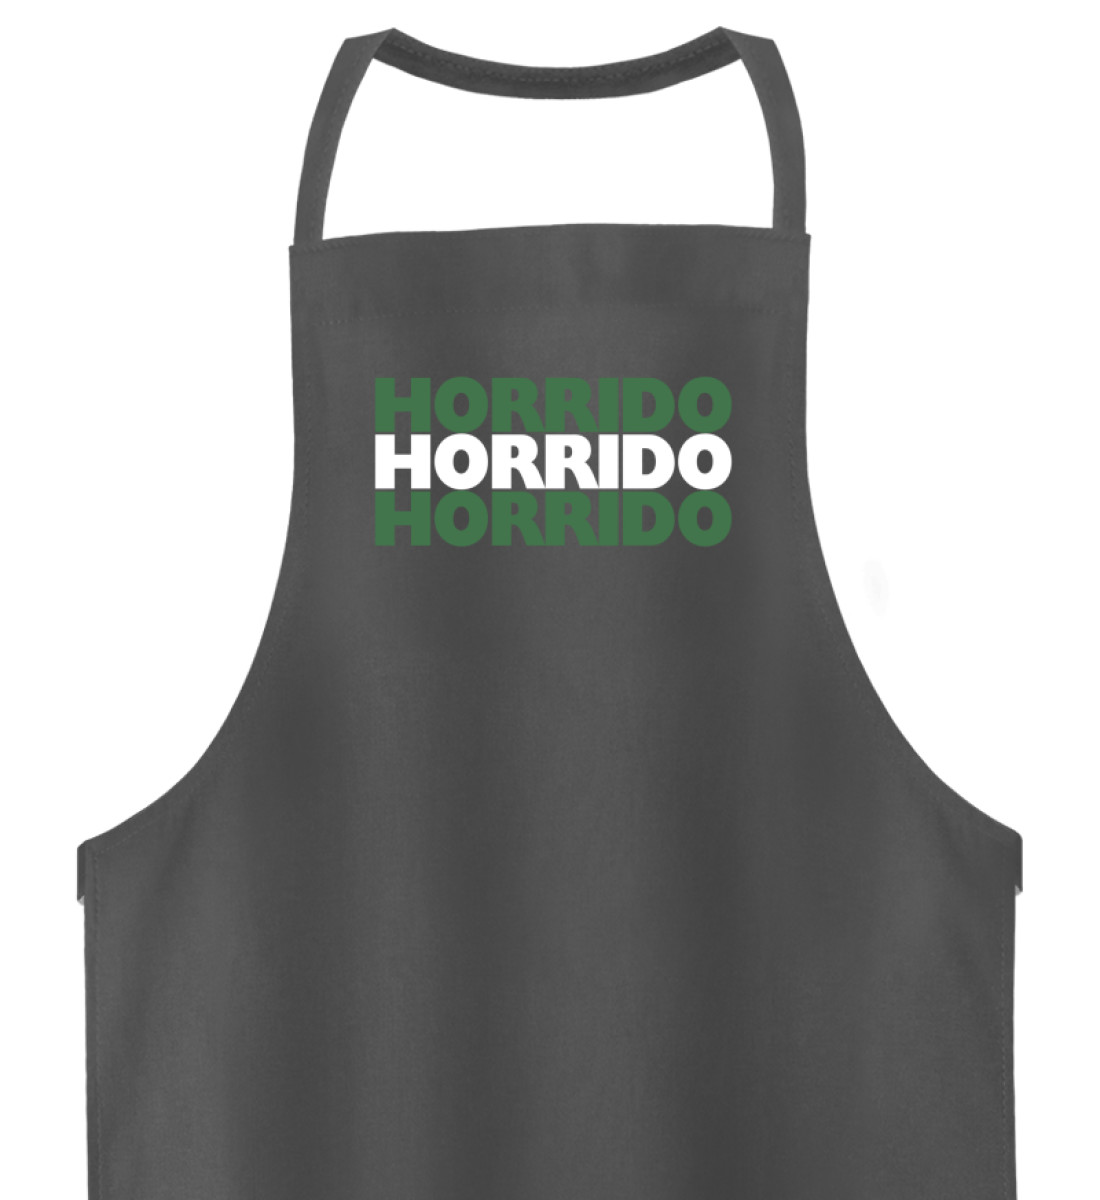 Horrido - Hochwertige Grillschürze-6778